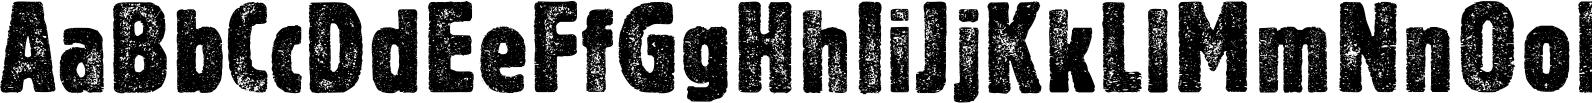 Bannertype